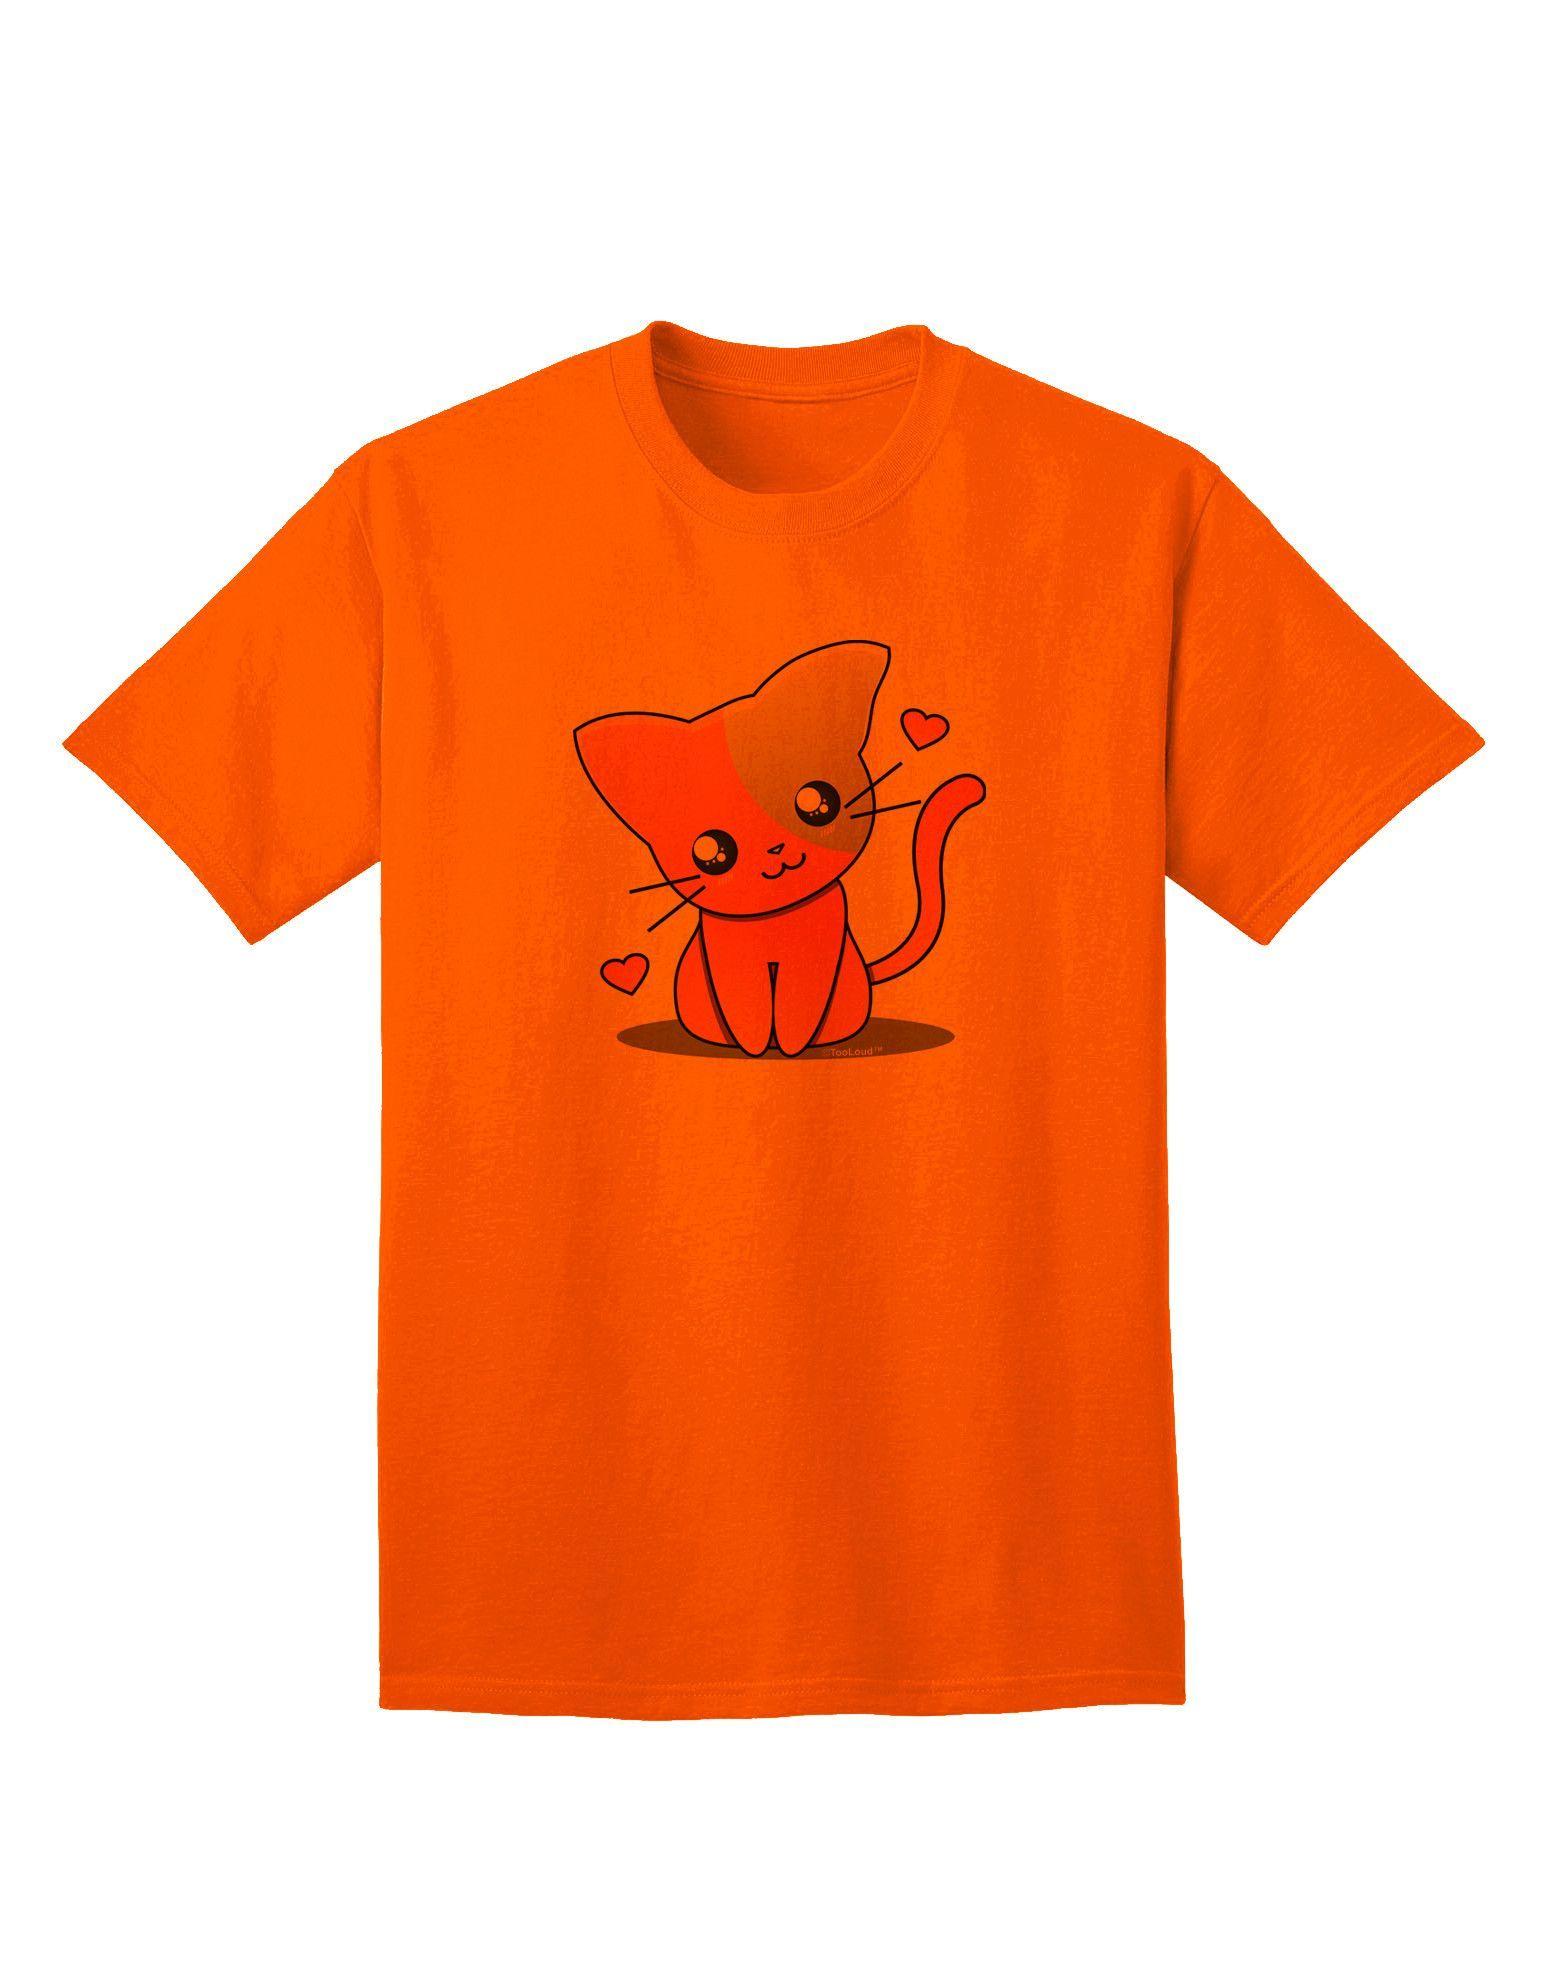 TooLoud Kawaii Kitty Adult T-Shirt